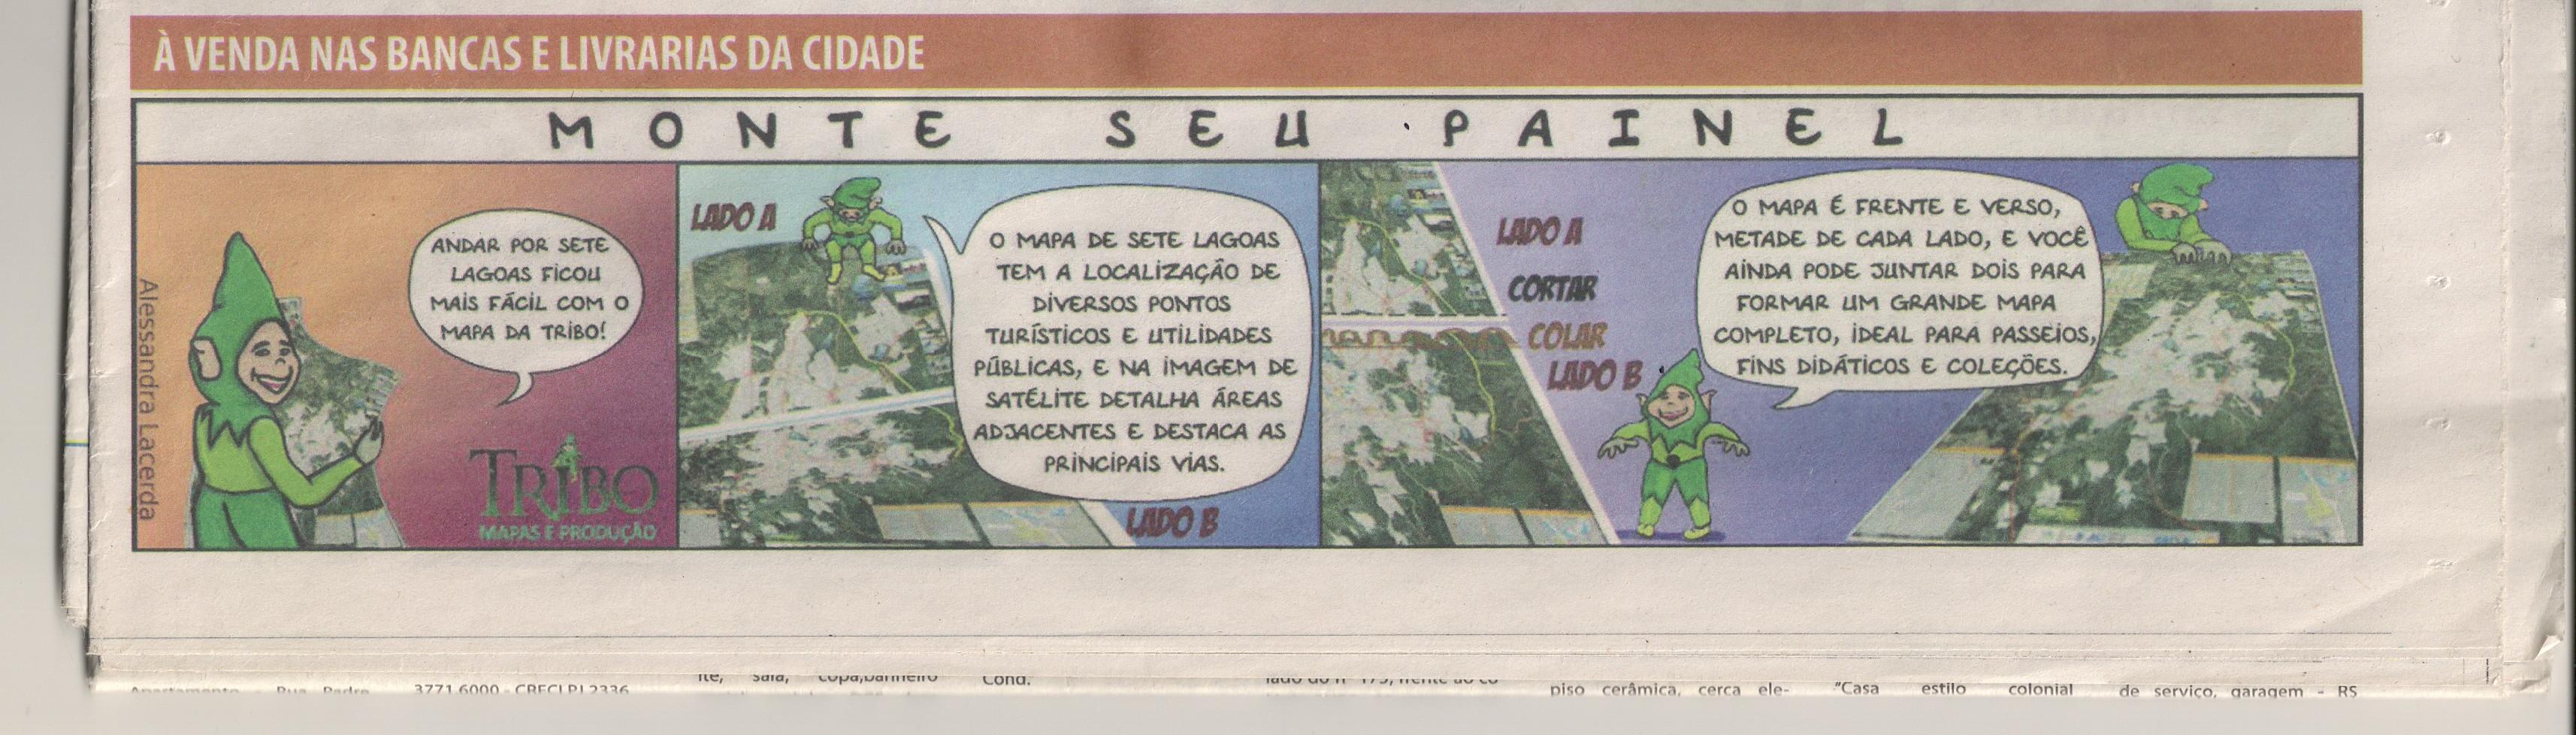 Tira Alessandra Jornal Sete Dias